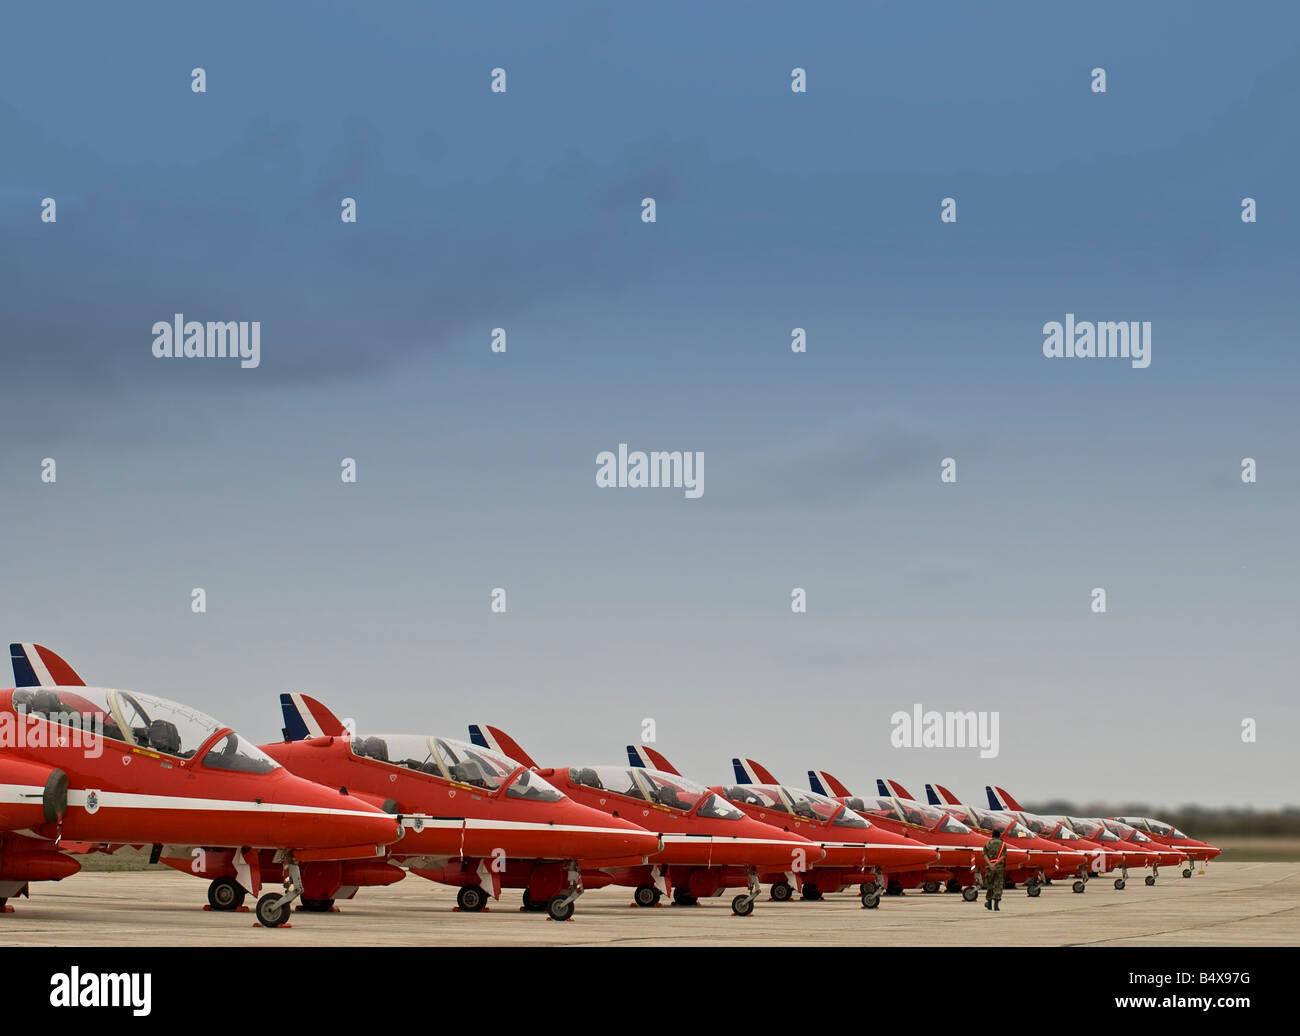 RAF Red Arrows Aerobatic Team Harriers on display - Stock Image